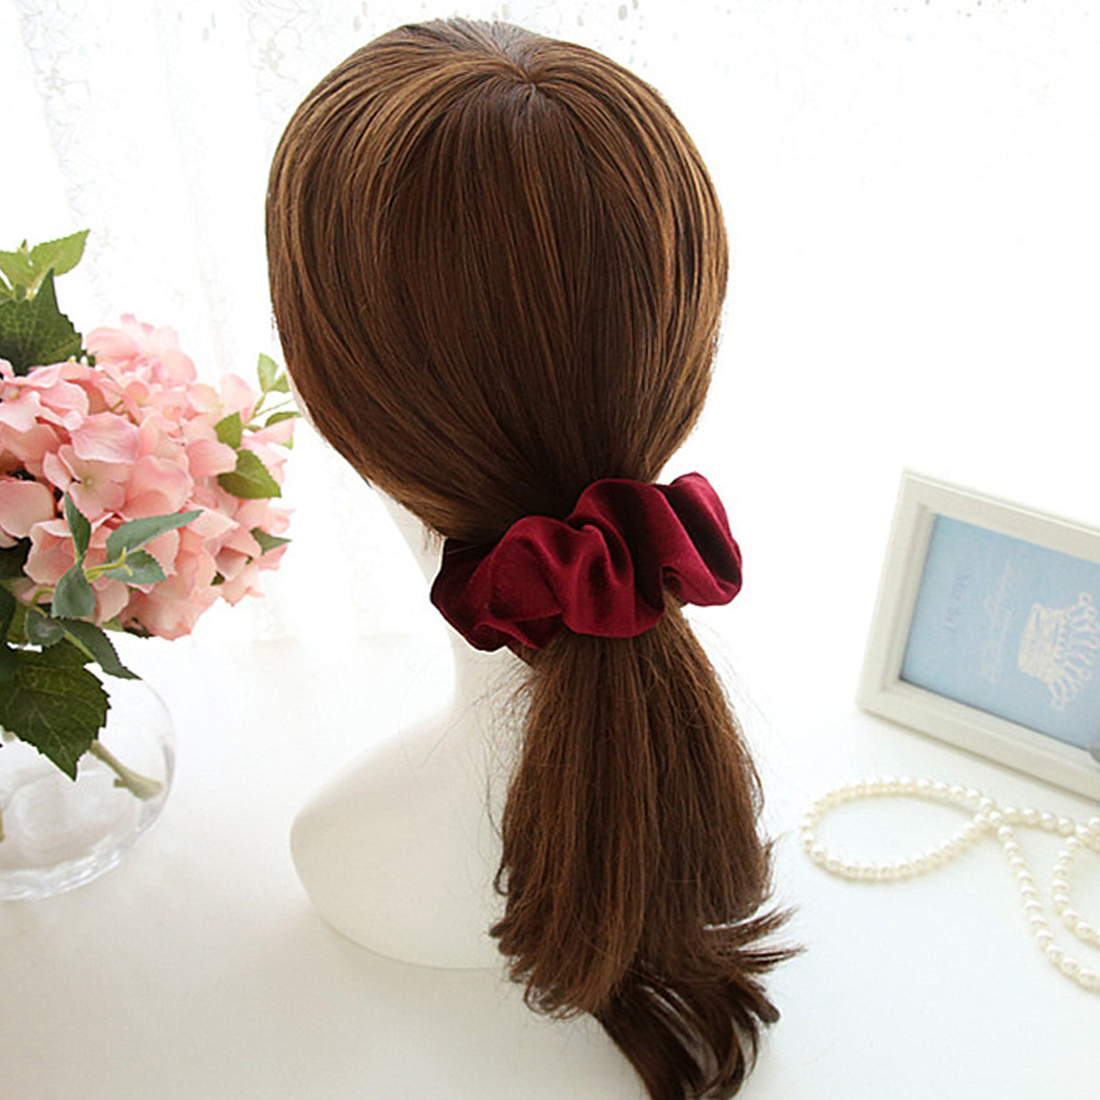 New arrival Velvet Elastic Hair Ropes Scrunchies Girls No Crease Hair Ties Women Hairbands Headdress Hair Accessories